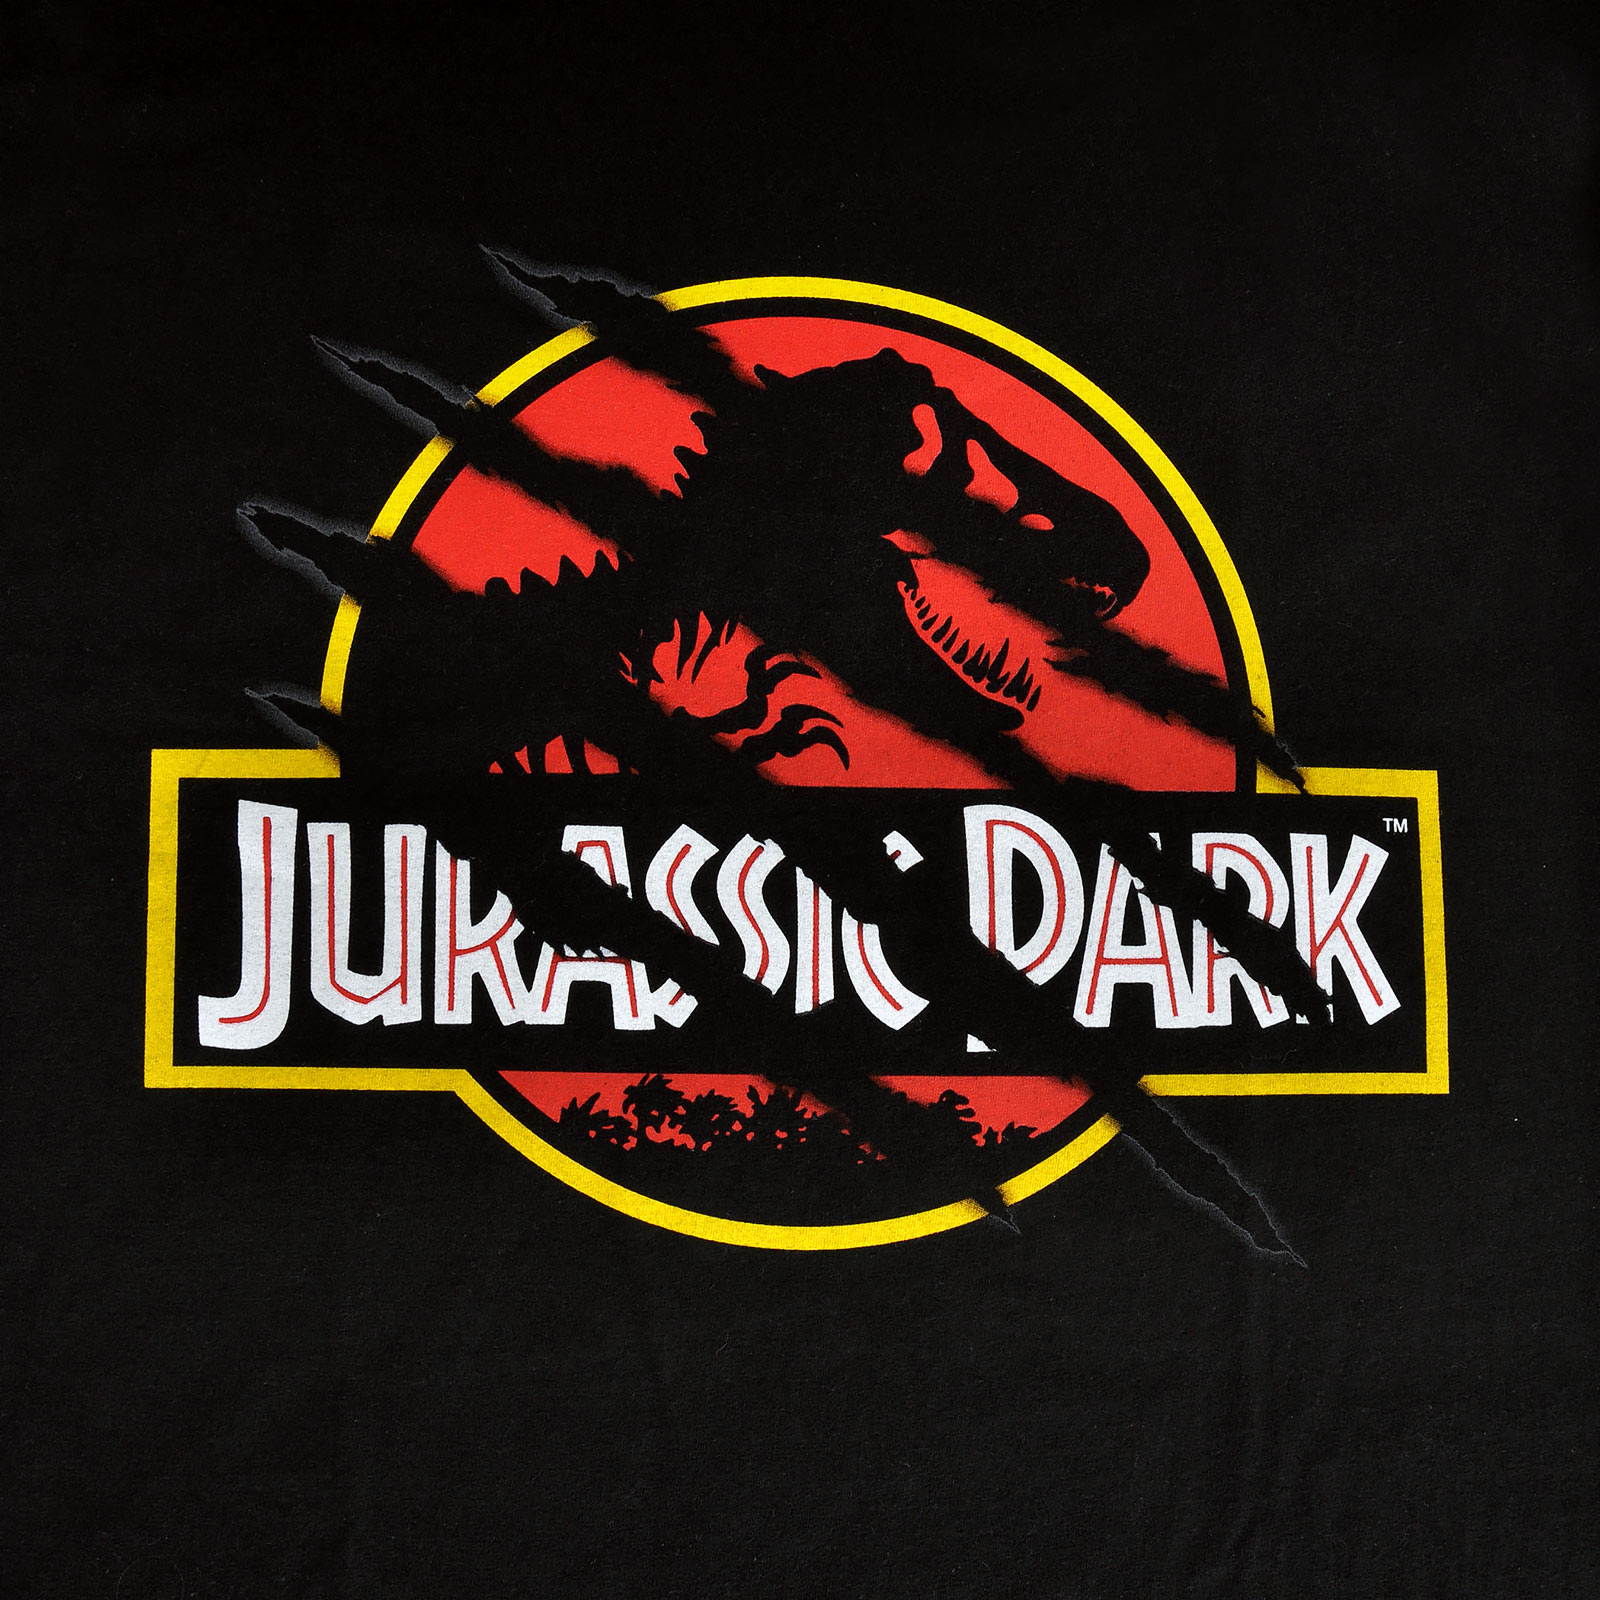 Jurassic Park - Ripped Movie Logo T-Shirt schwarz